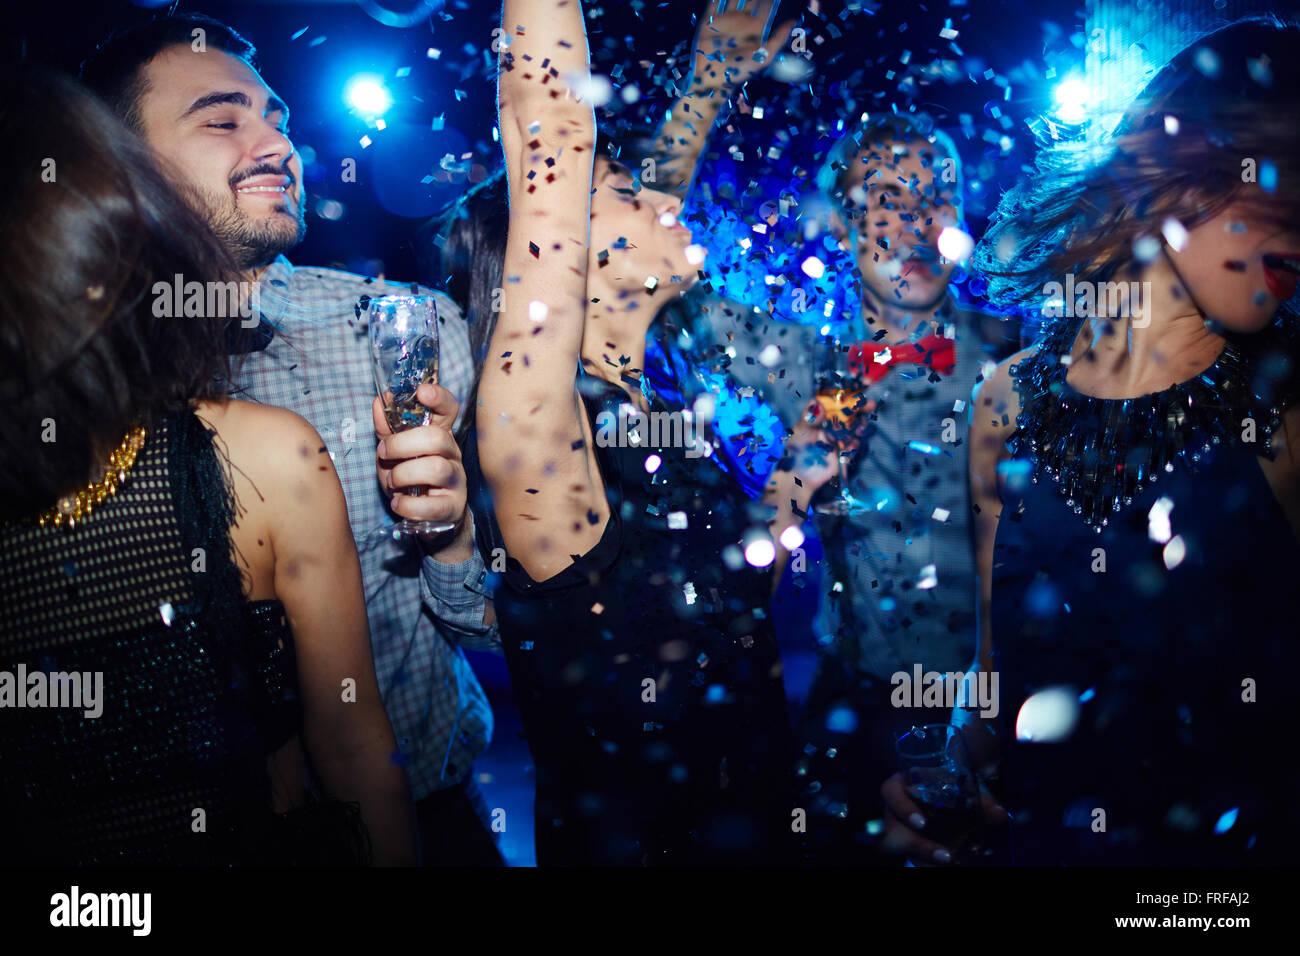 Energetic dancing - Stock Image